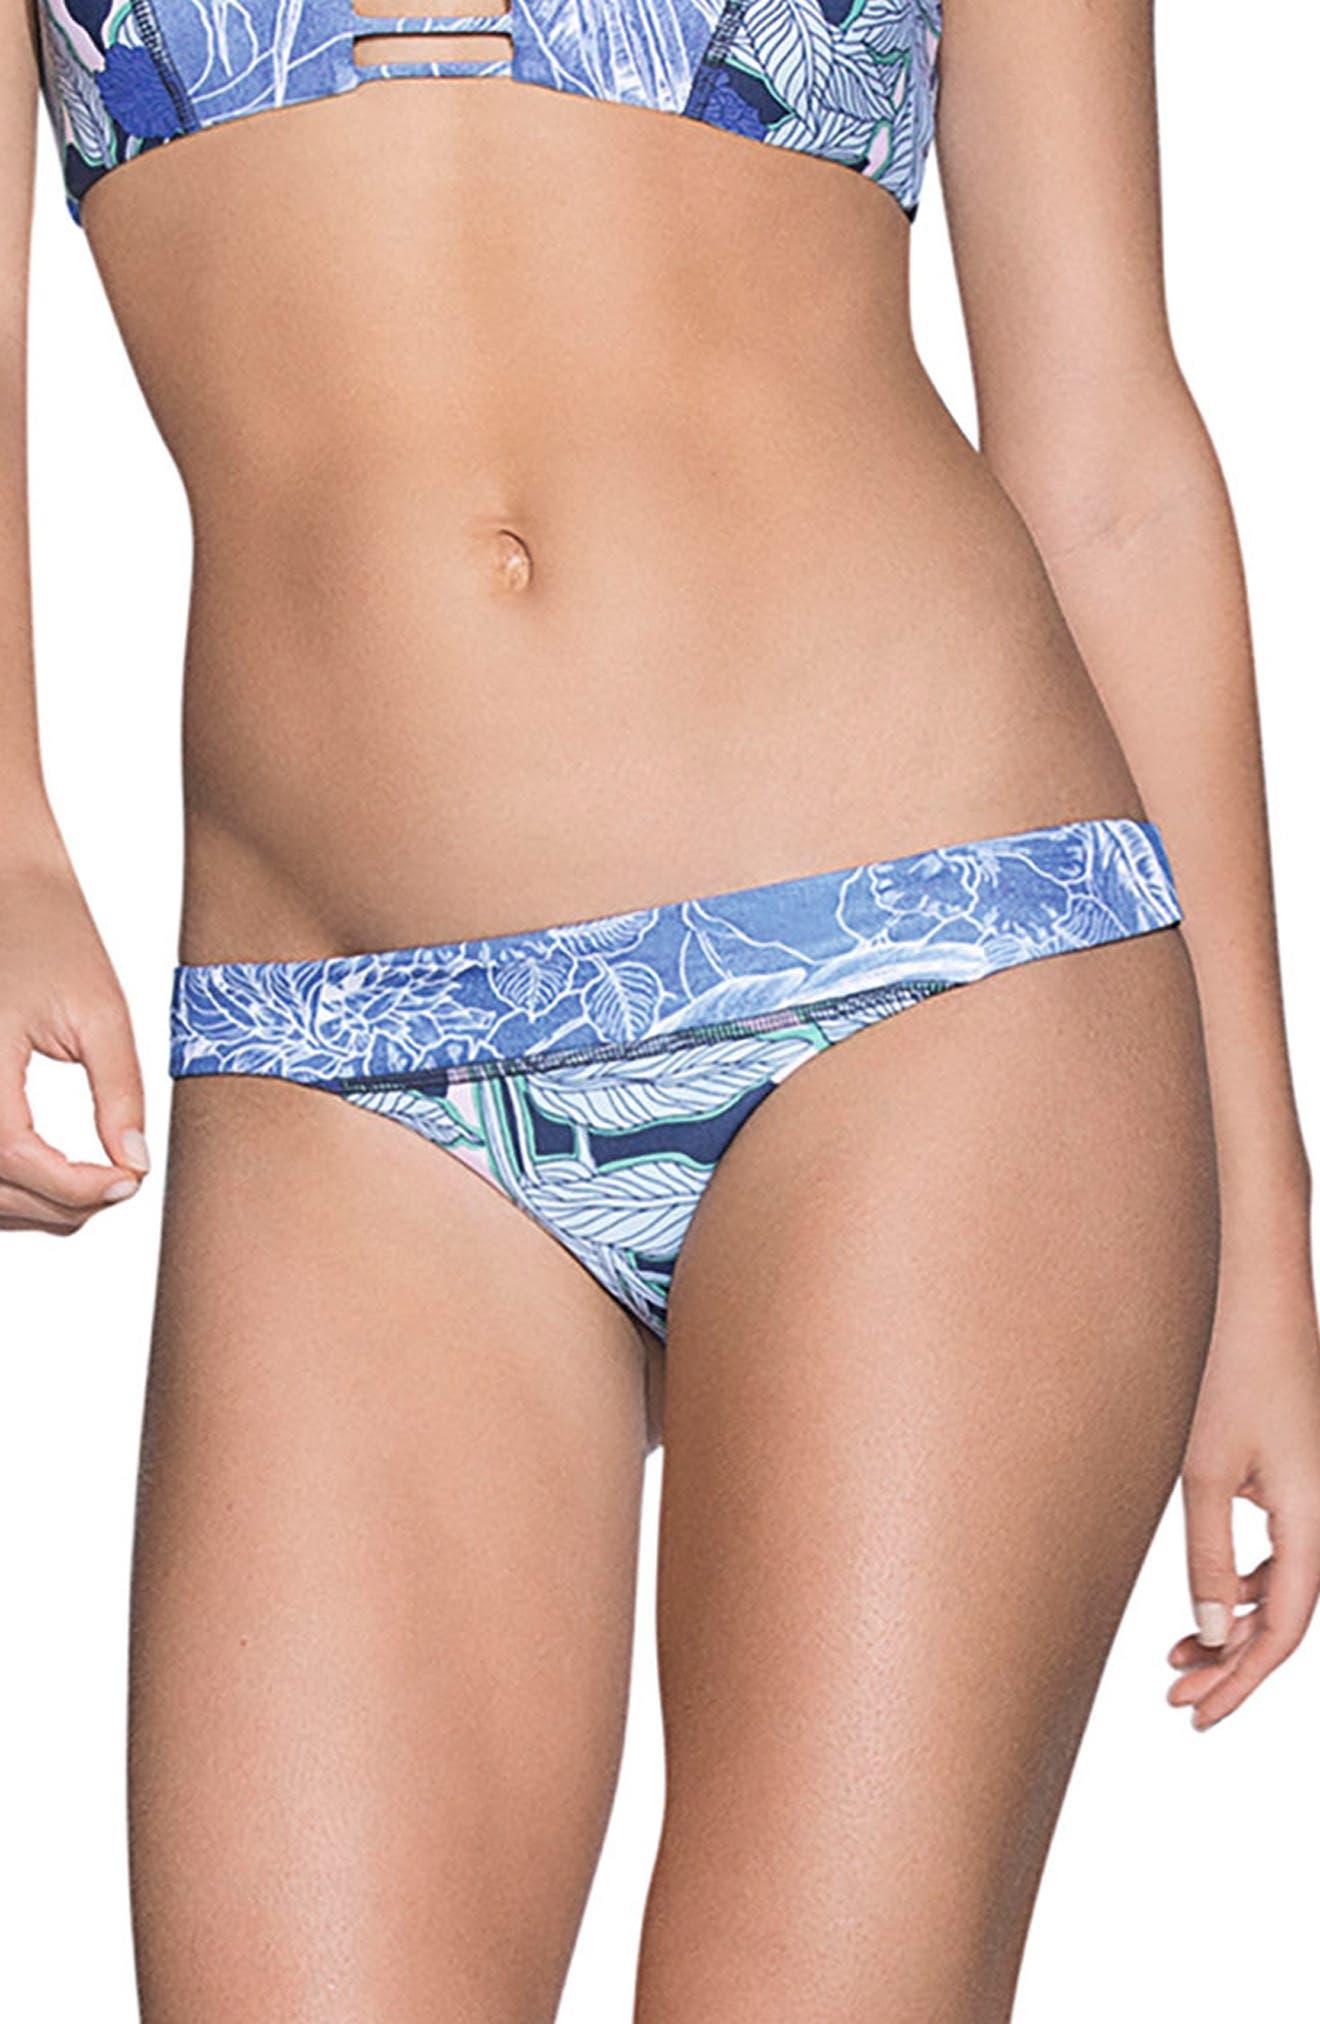 Gorgona Forest Signature Cut Reversible Bikini Bottoms,                             Main thumbnail 1, color,